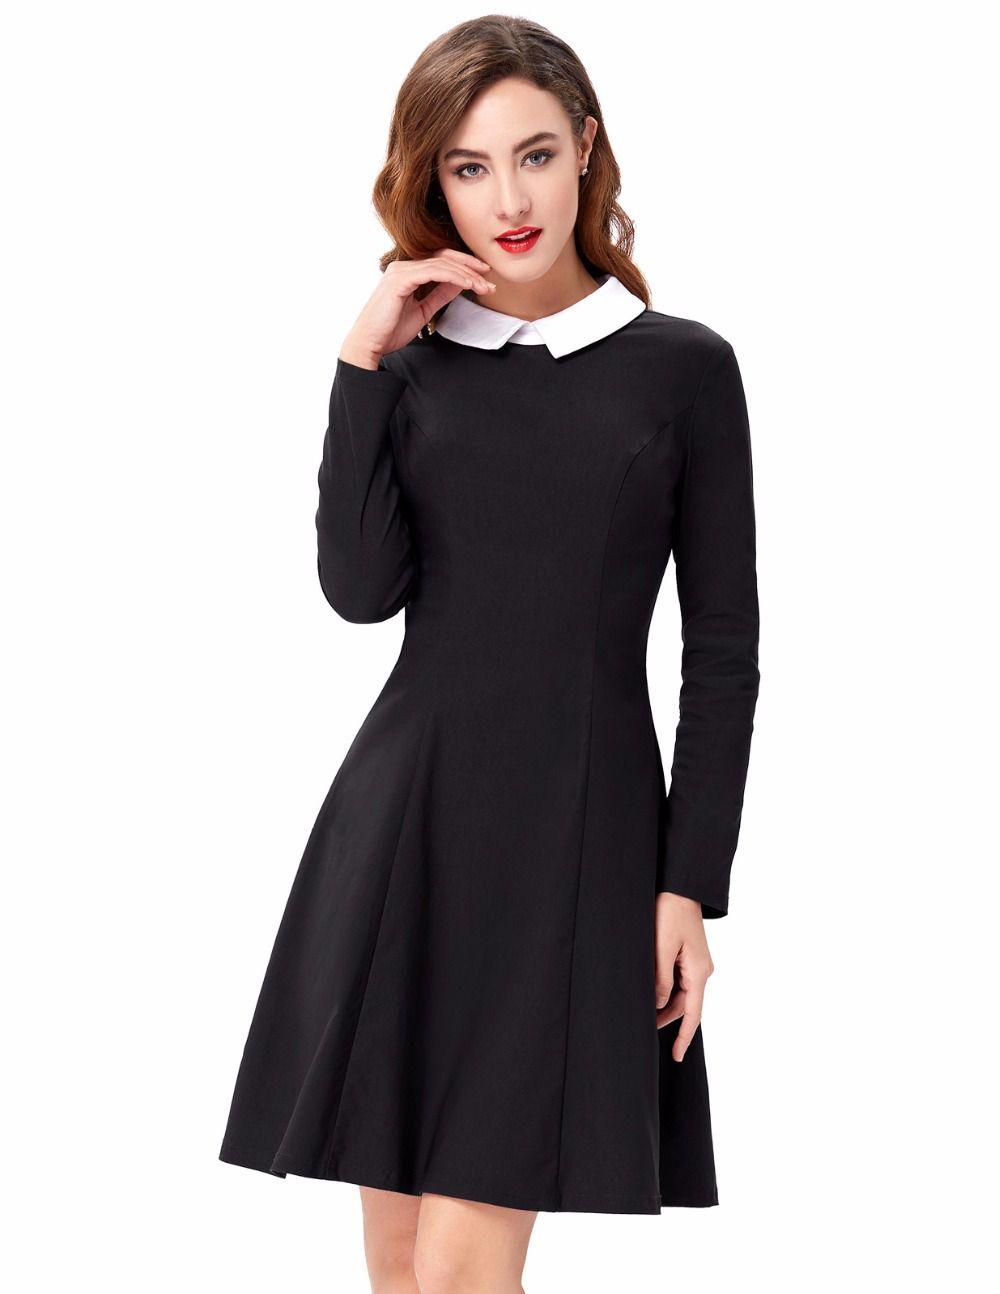 Wholesale Womens Sexy Elegant Winter Fashion Women Stylish Slim Fit Long Sleeve Contrast Color Doll Collar A-Line Dress Bodyco